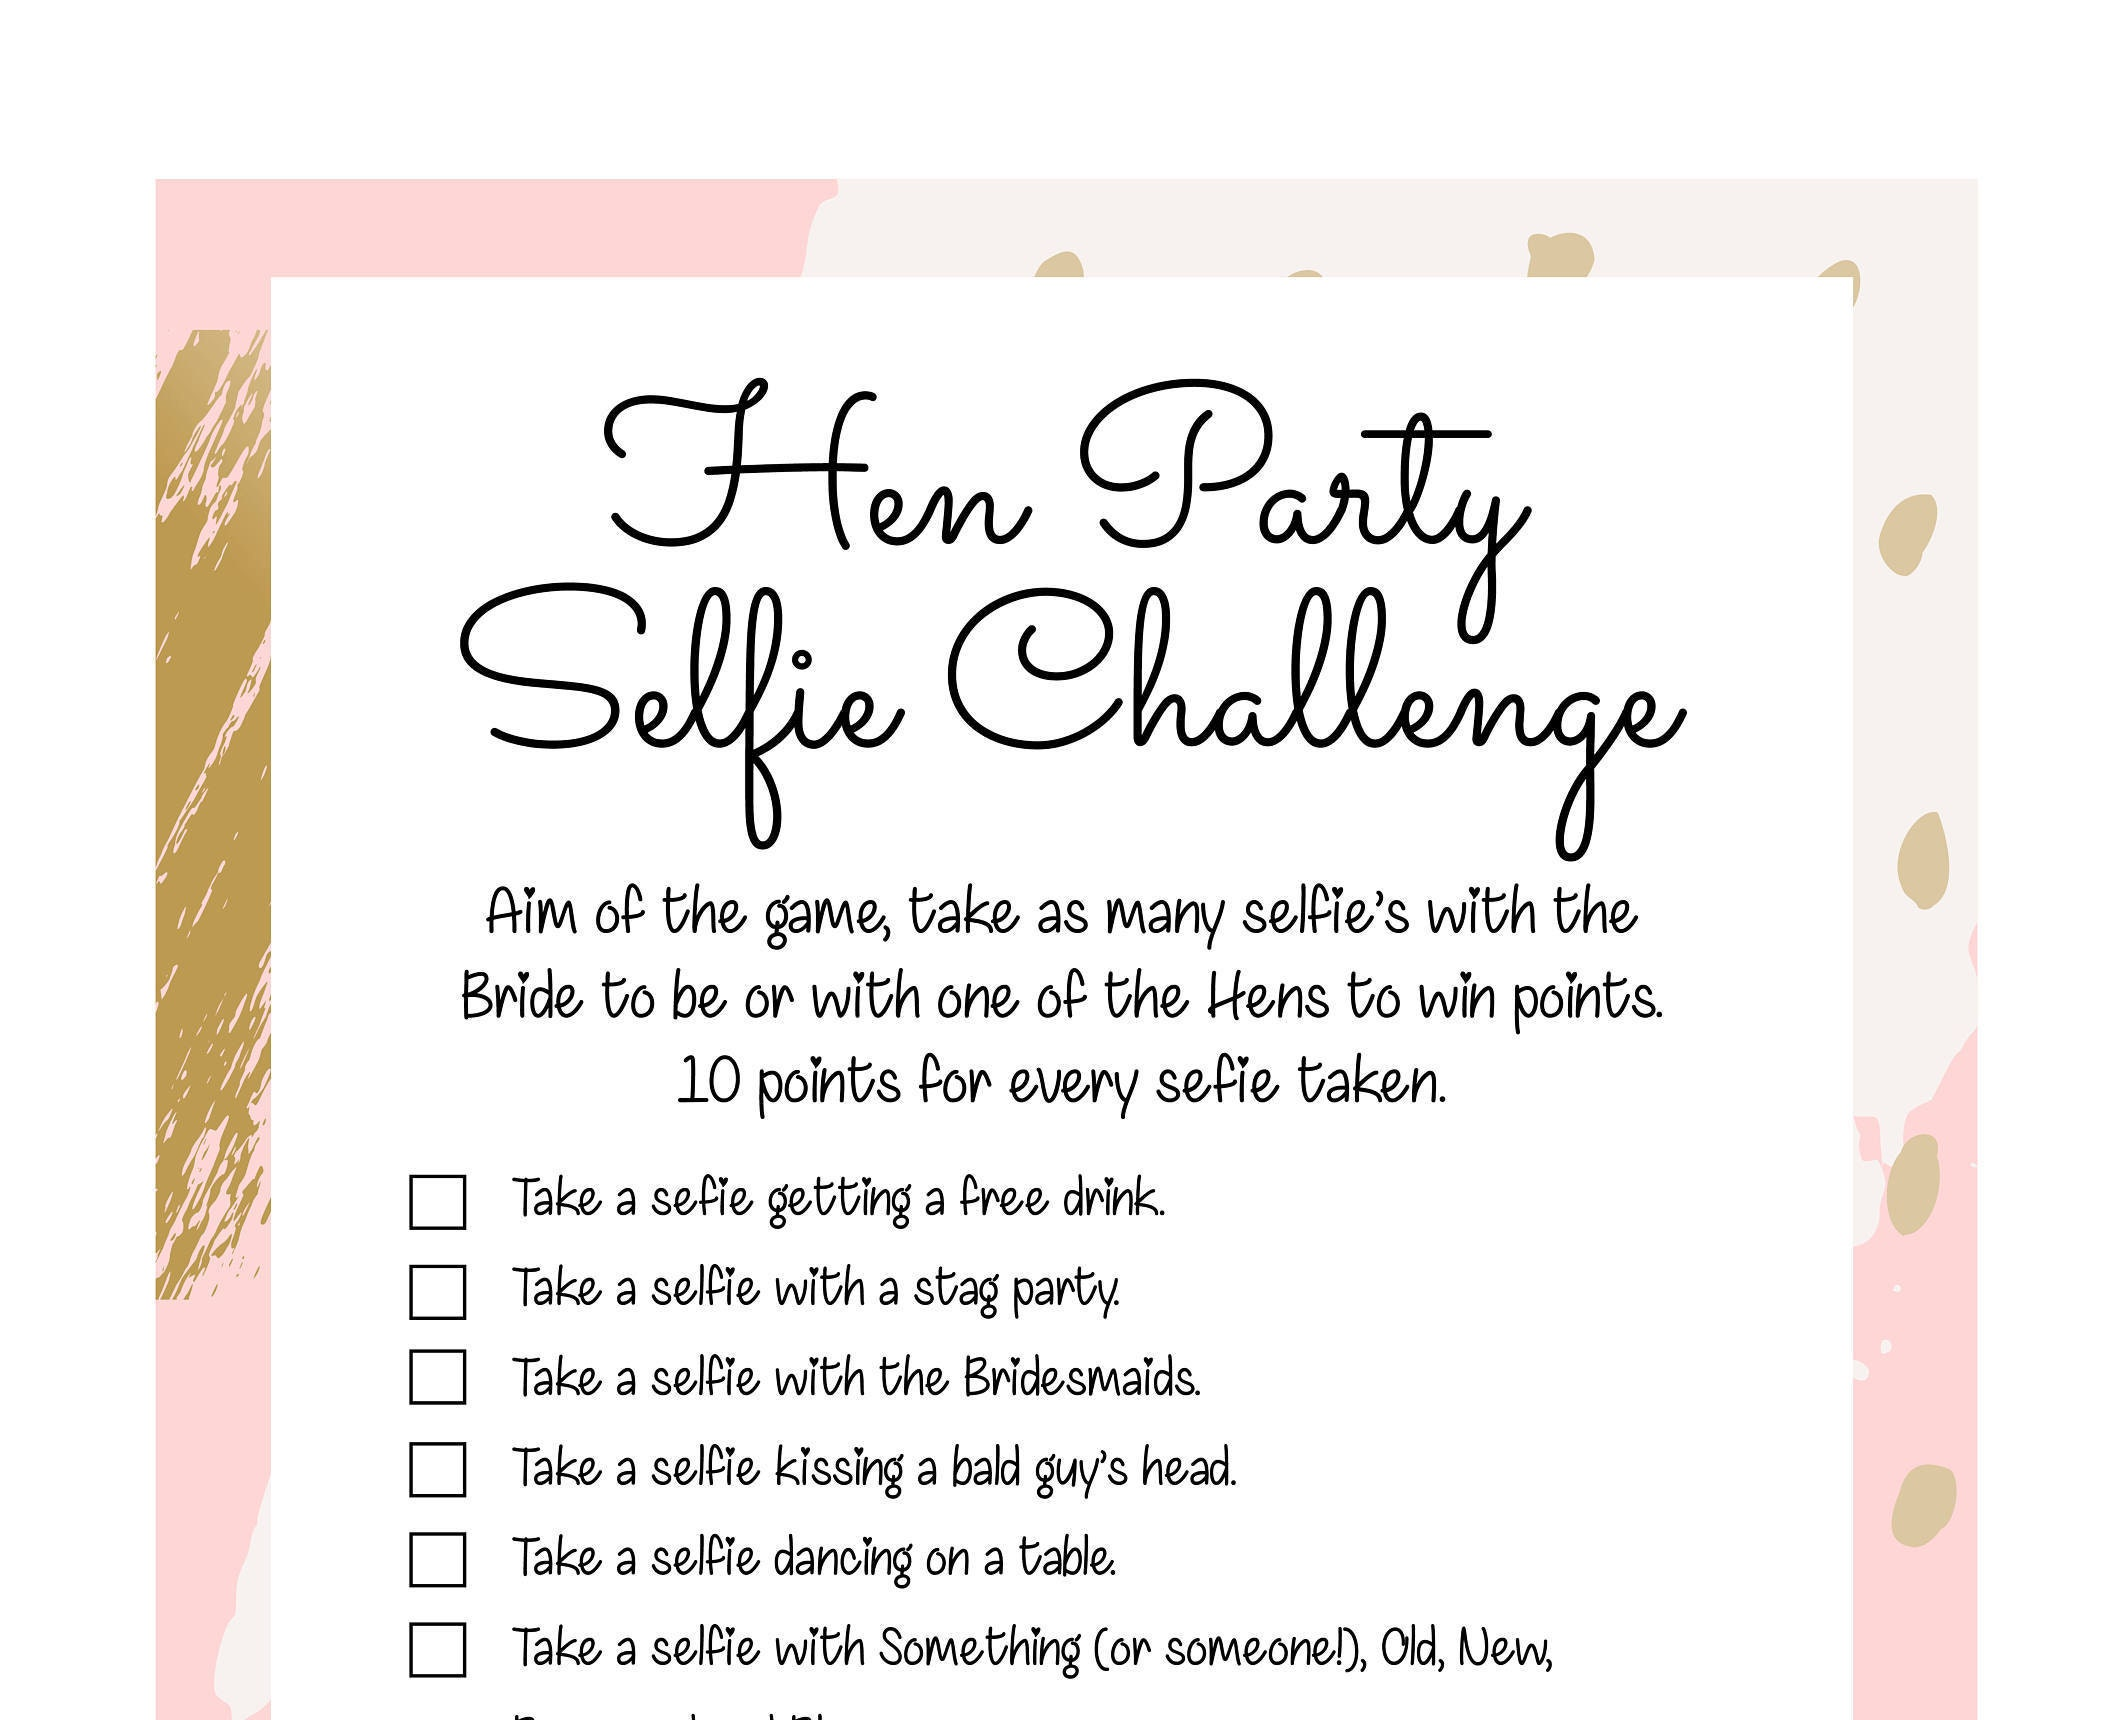 Hen Party games. Hen Party Selfie/Photo challenge. Hen Party